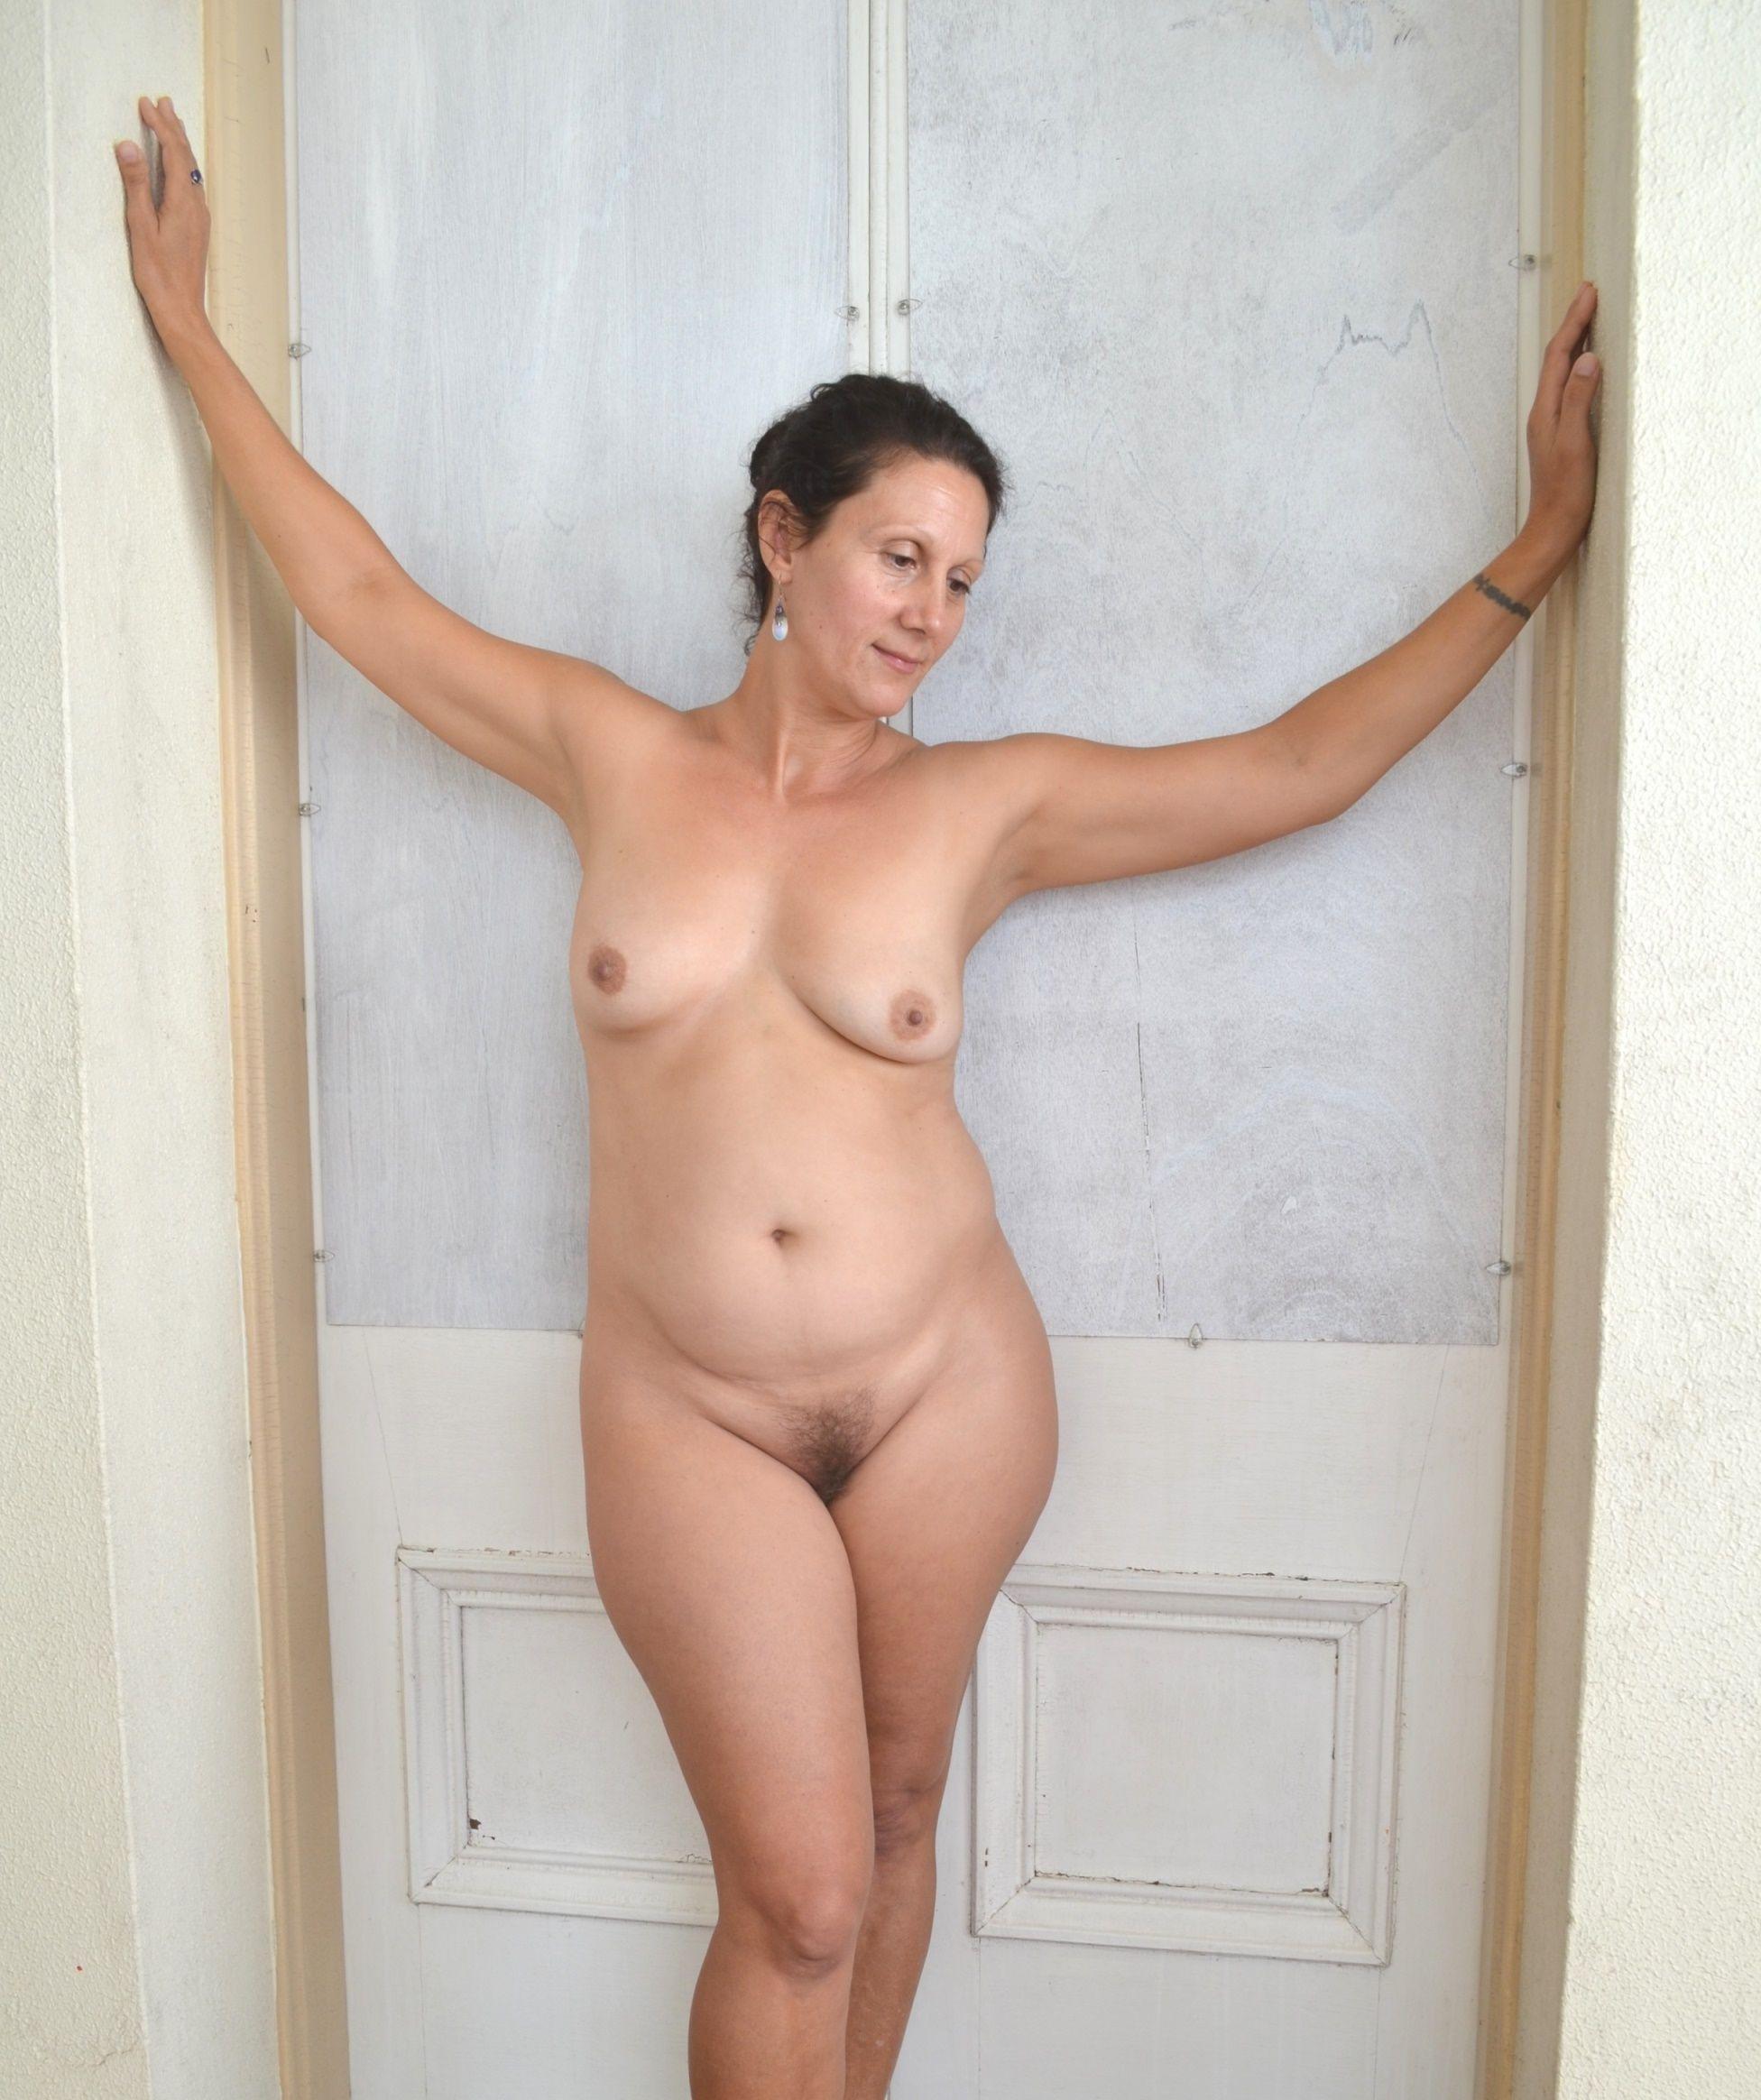 Huge tits at work